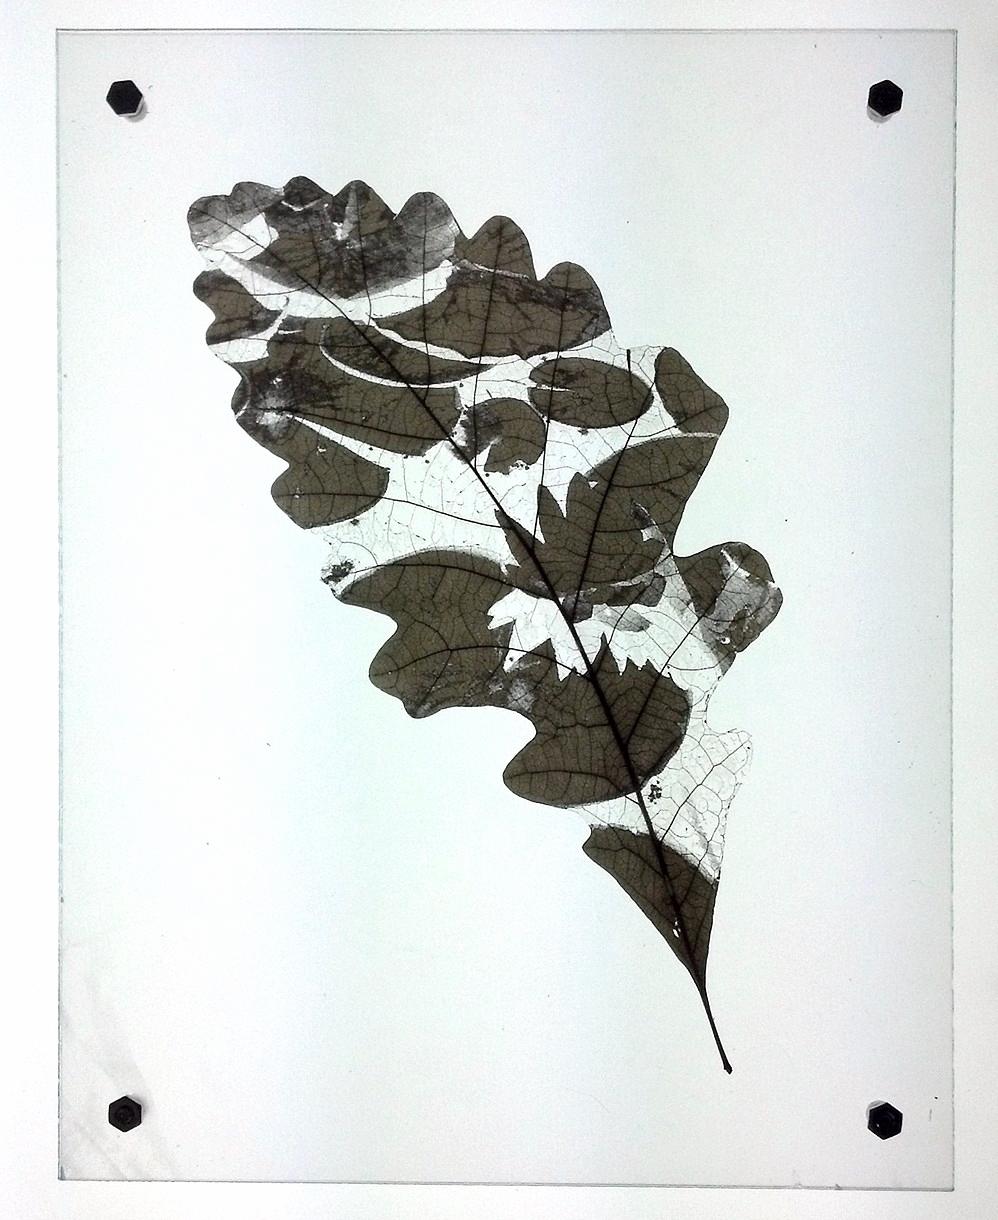 Oak_Minus_Lotus.jpg